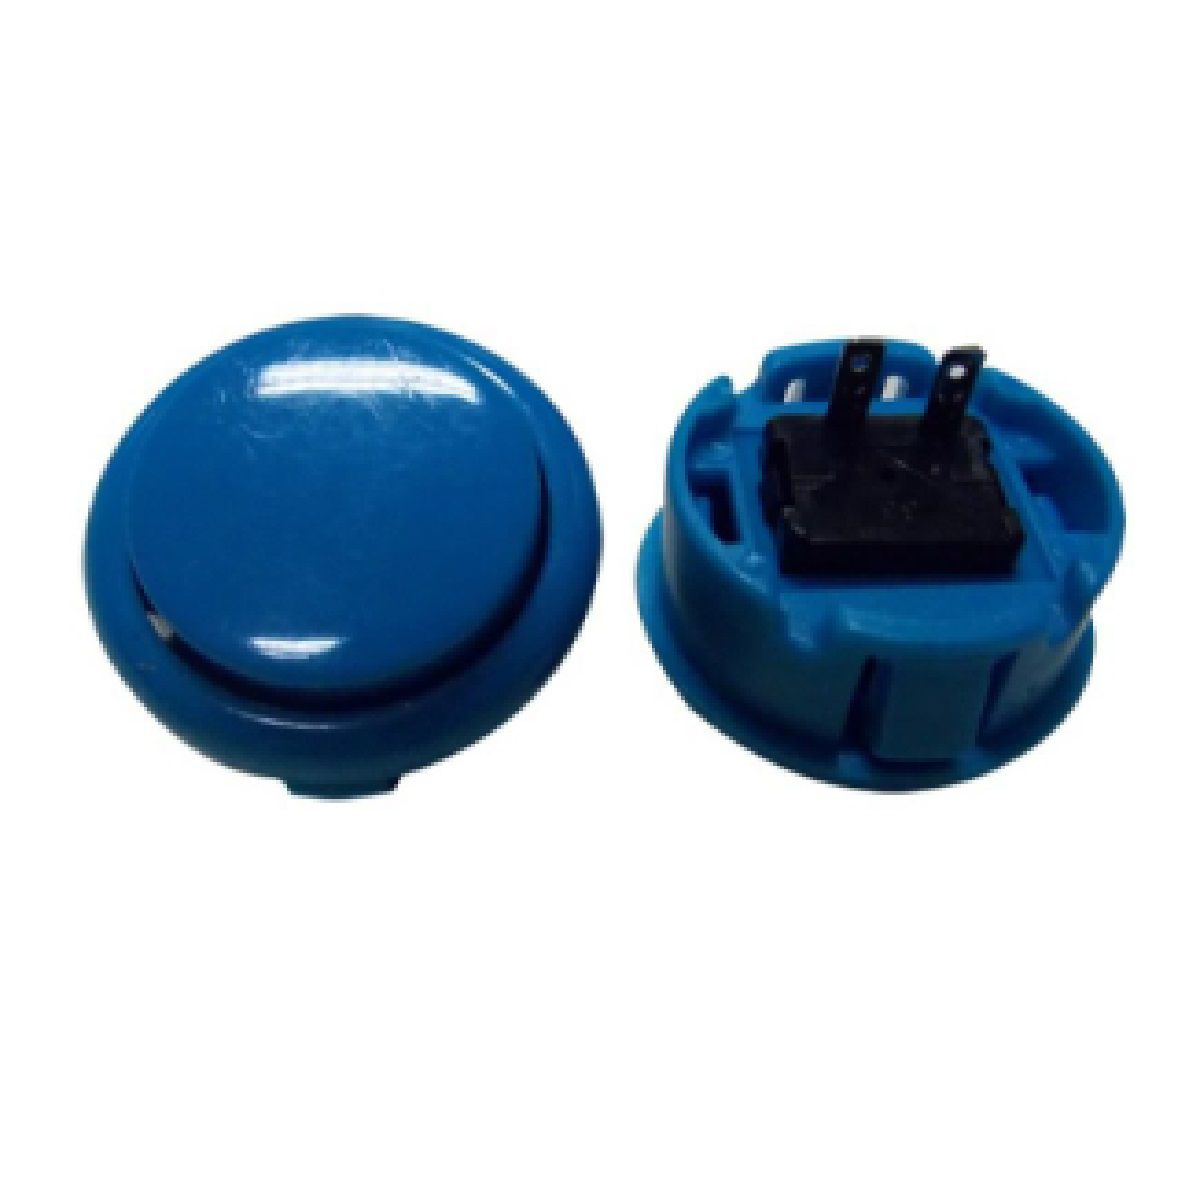 Botão Arcade Fliperama Alta Performance Tipo Sanwa (conector 2.8mm) Azul